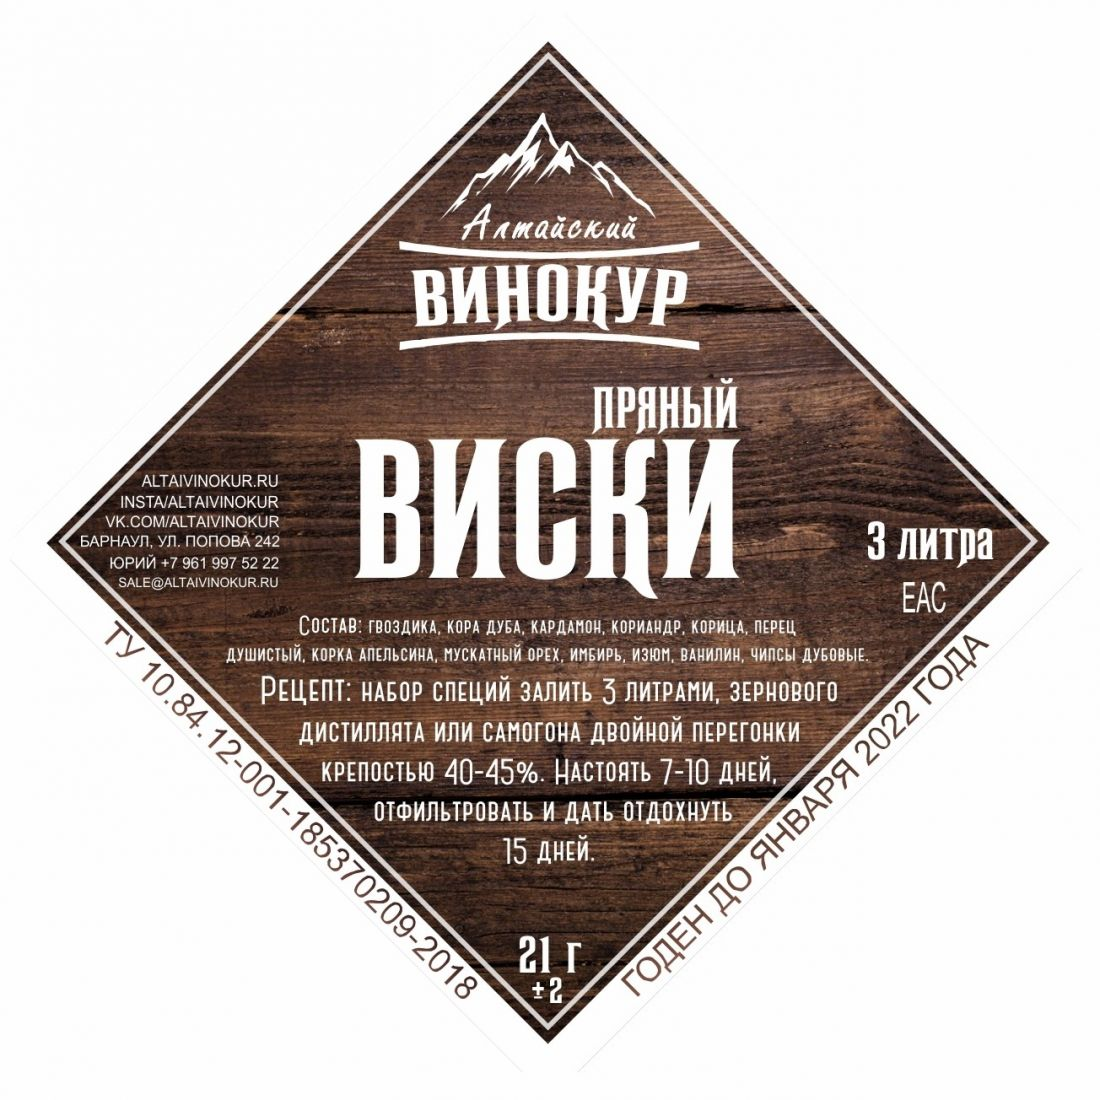 Настойка Пряный Виски, набор трав (Алтайский Винокур)